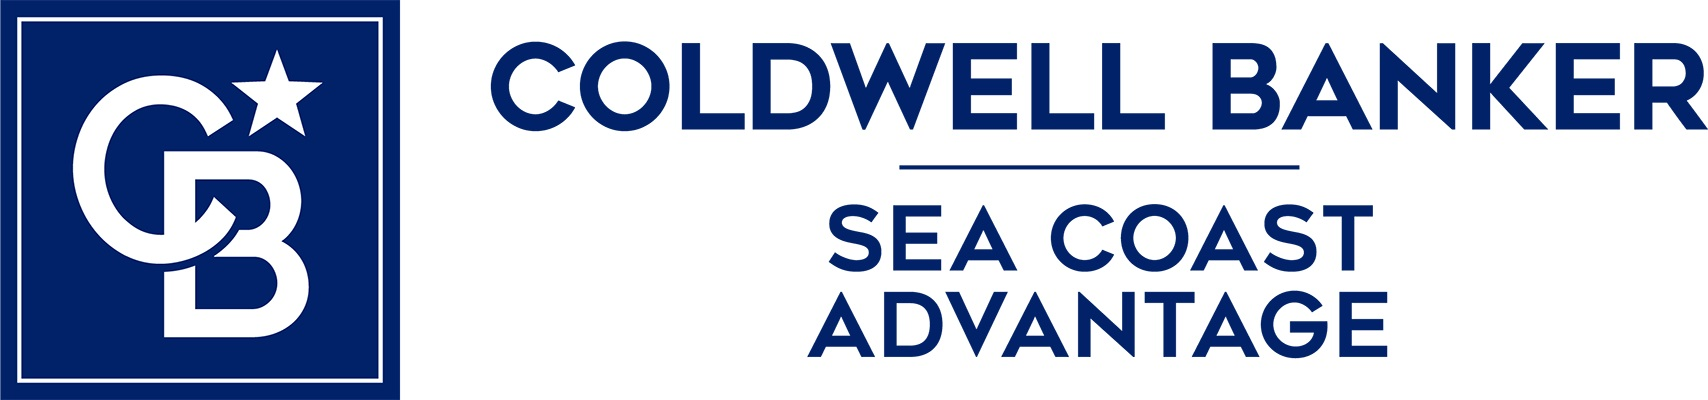 Brett Knowles - Coldwell Banker Sea Coast Advantage Realty Logo